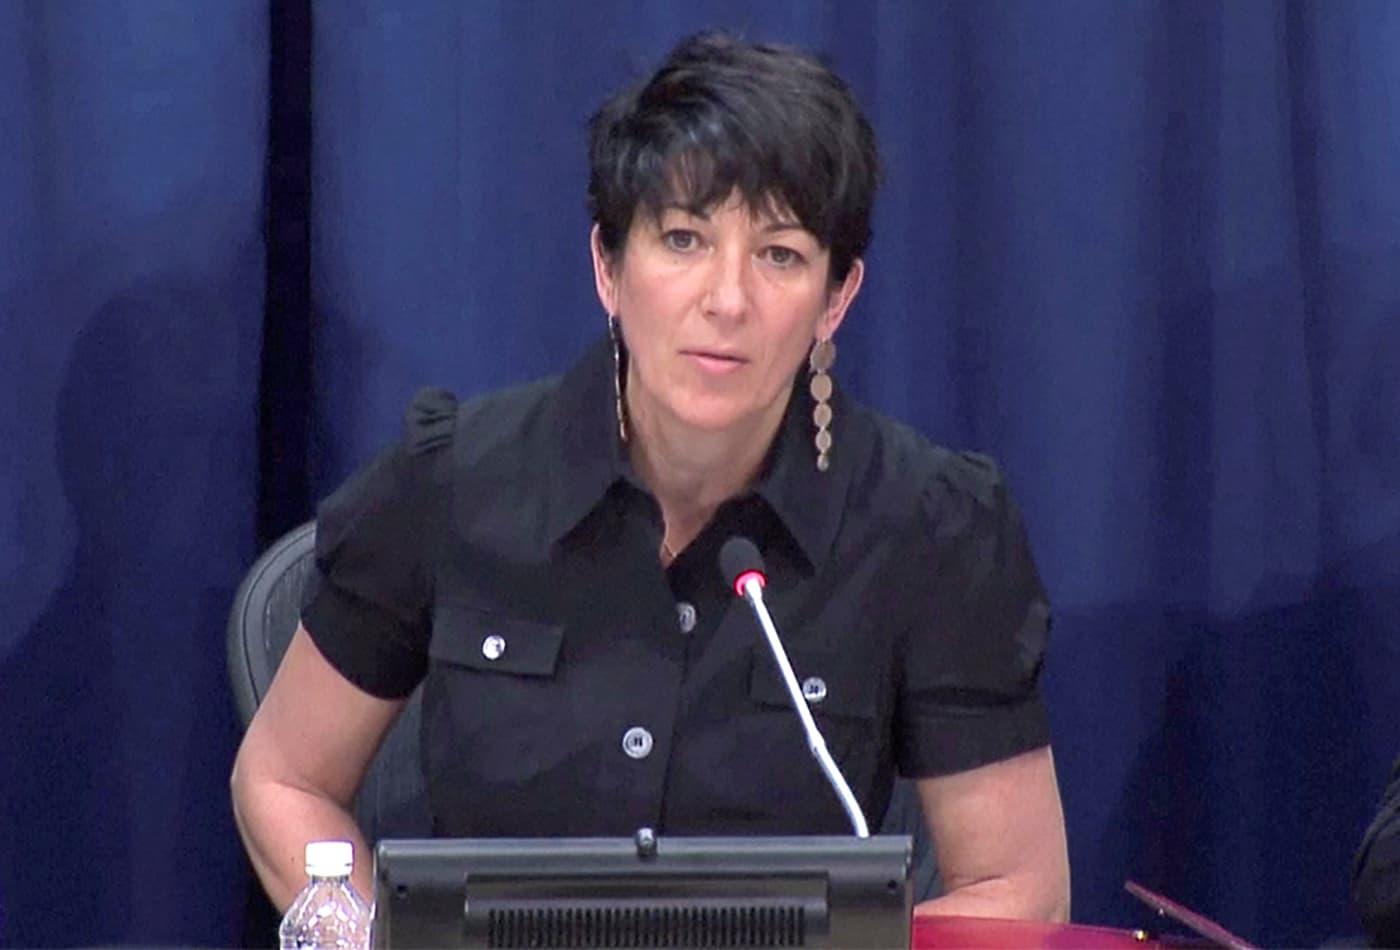 Alleged Jeffrey Epstein madam Ghislaine Maxwell wants bail hearing just before Christmas